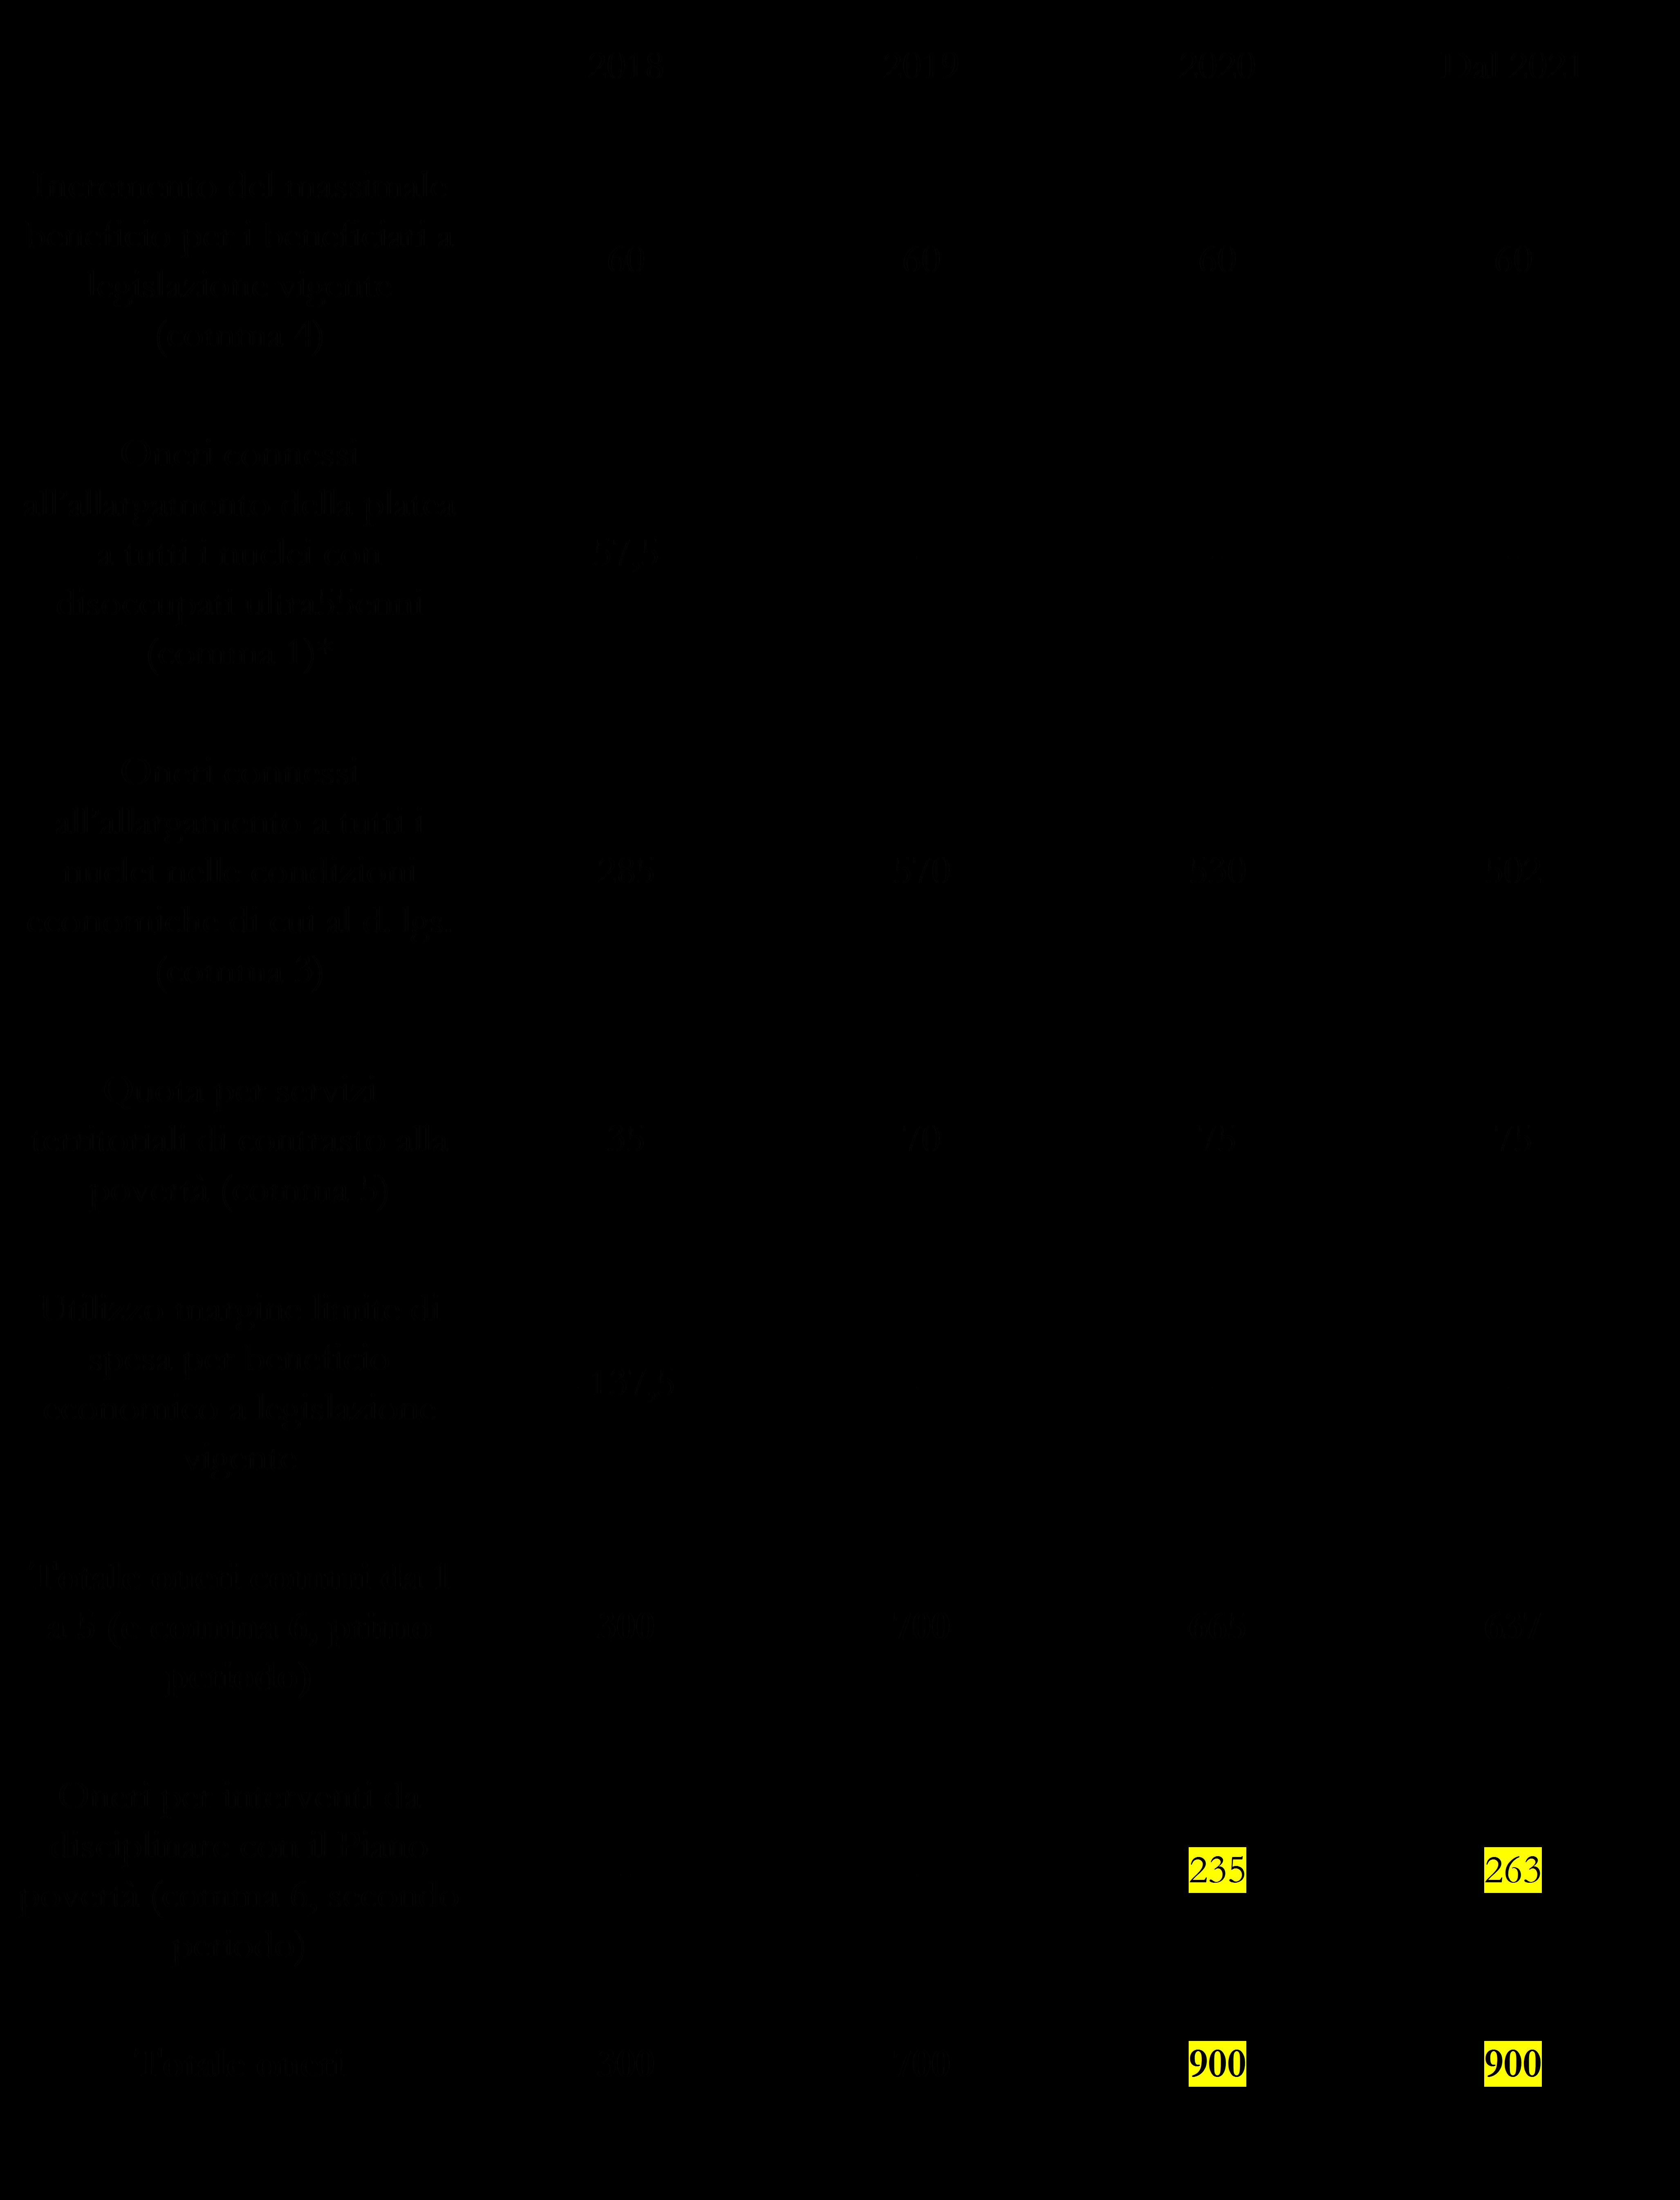 Calendario Scolastico 2020 16 Veneto.Legislatura 17ª Dossier N 195